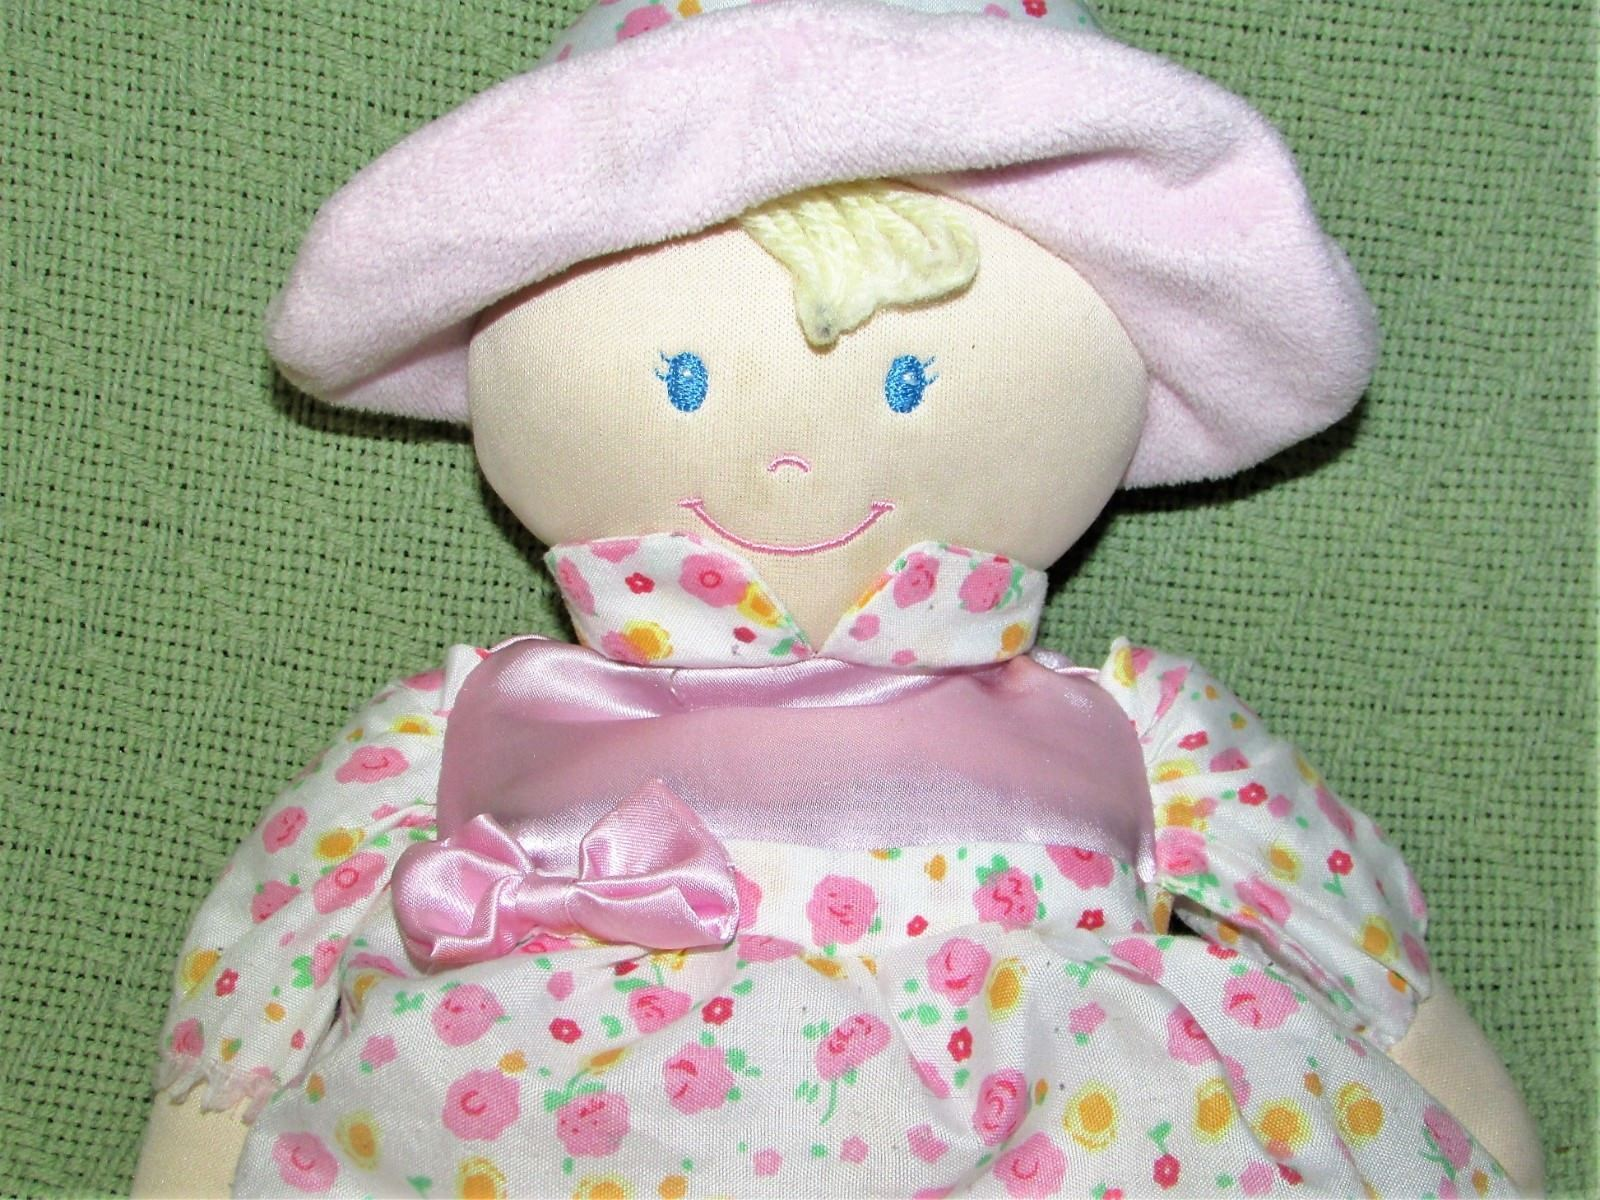 "Kids Preferred Plush BABY DOLL Pink 12"" Blue Eyes Satiny Flower Dress Hat 2012 image 2"